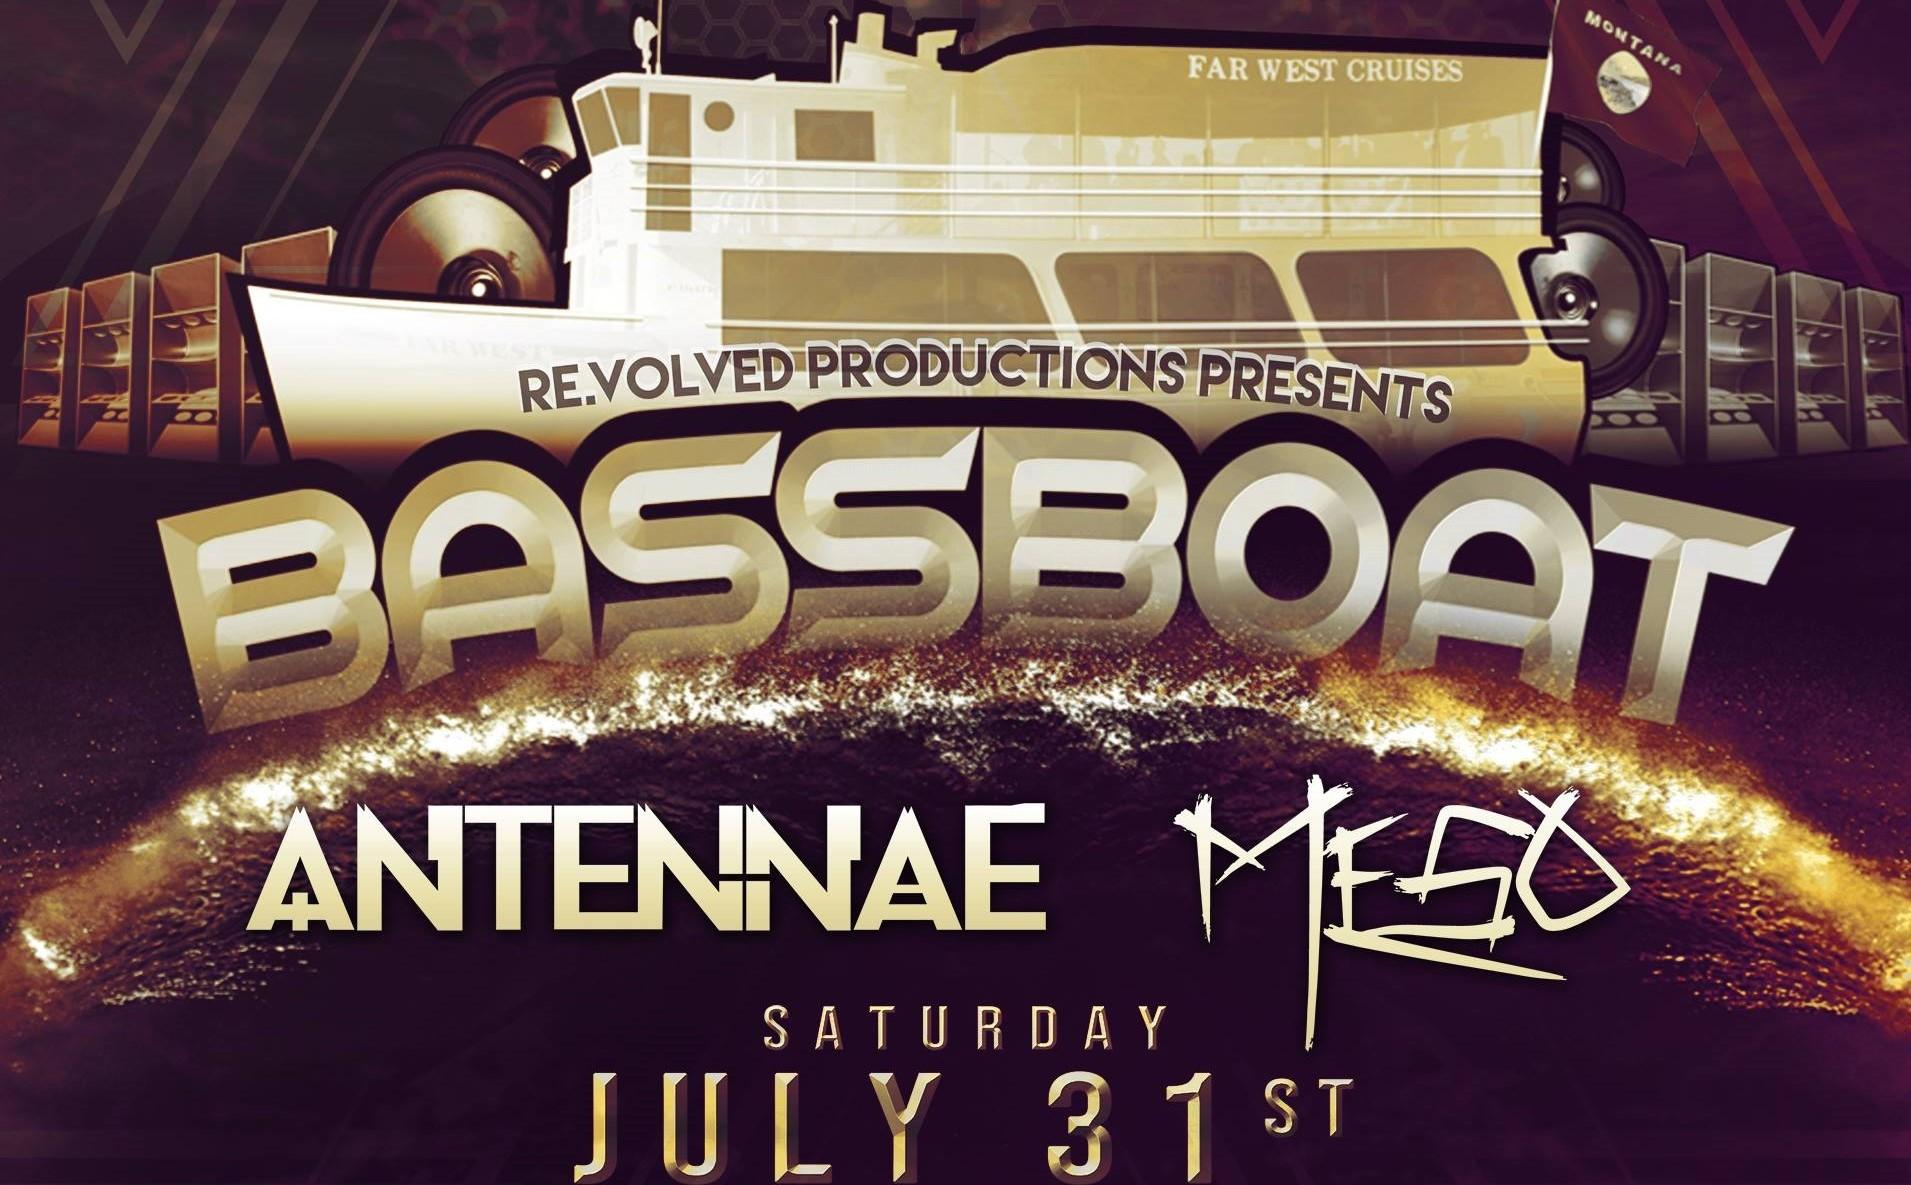 BassBoat: featuring An-ten-nae & MeSo